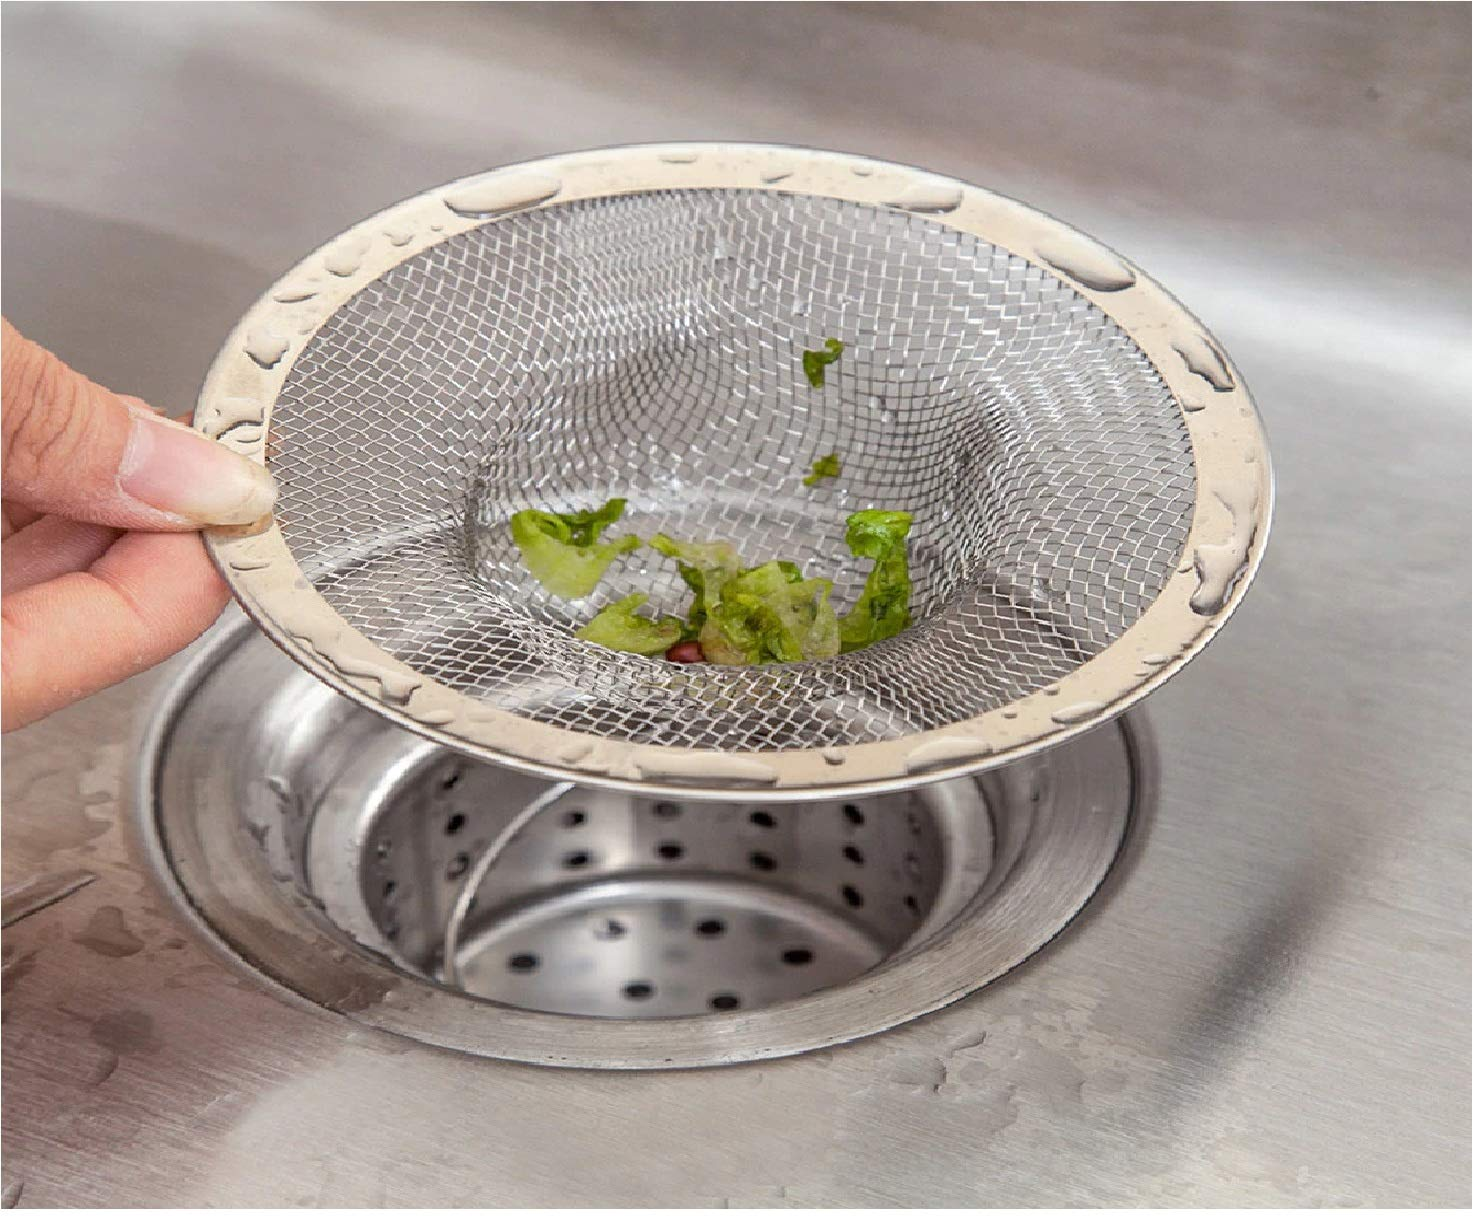 Sink Strainer Stainless Steel Kitchen Waste Drain Stopper Filter Net Drainer CO